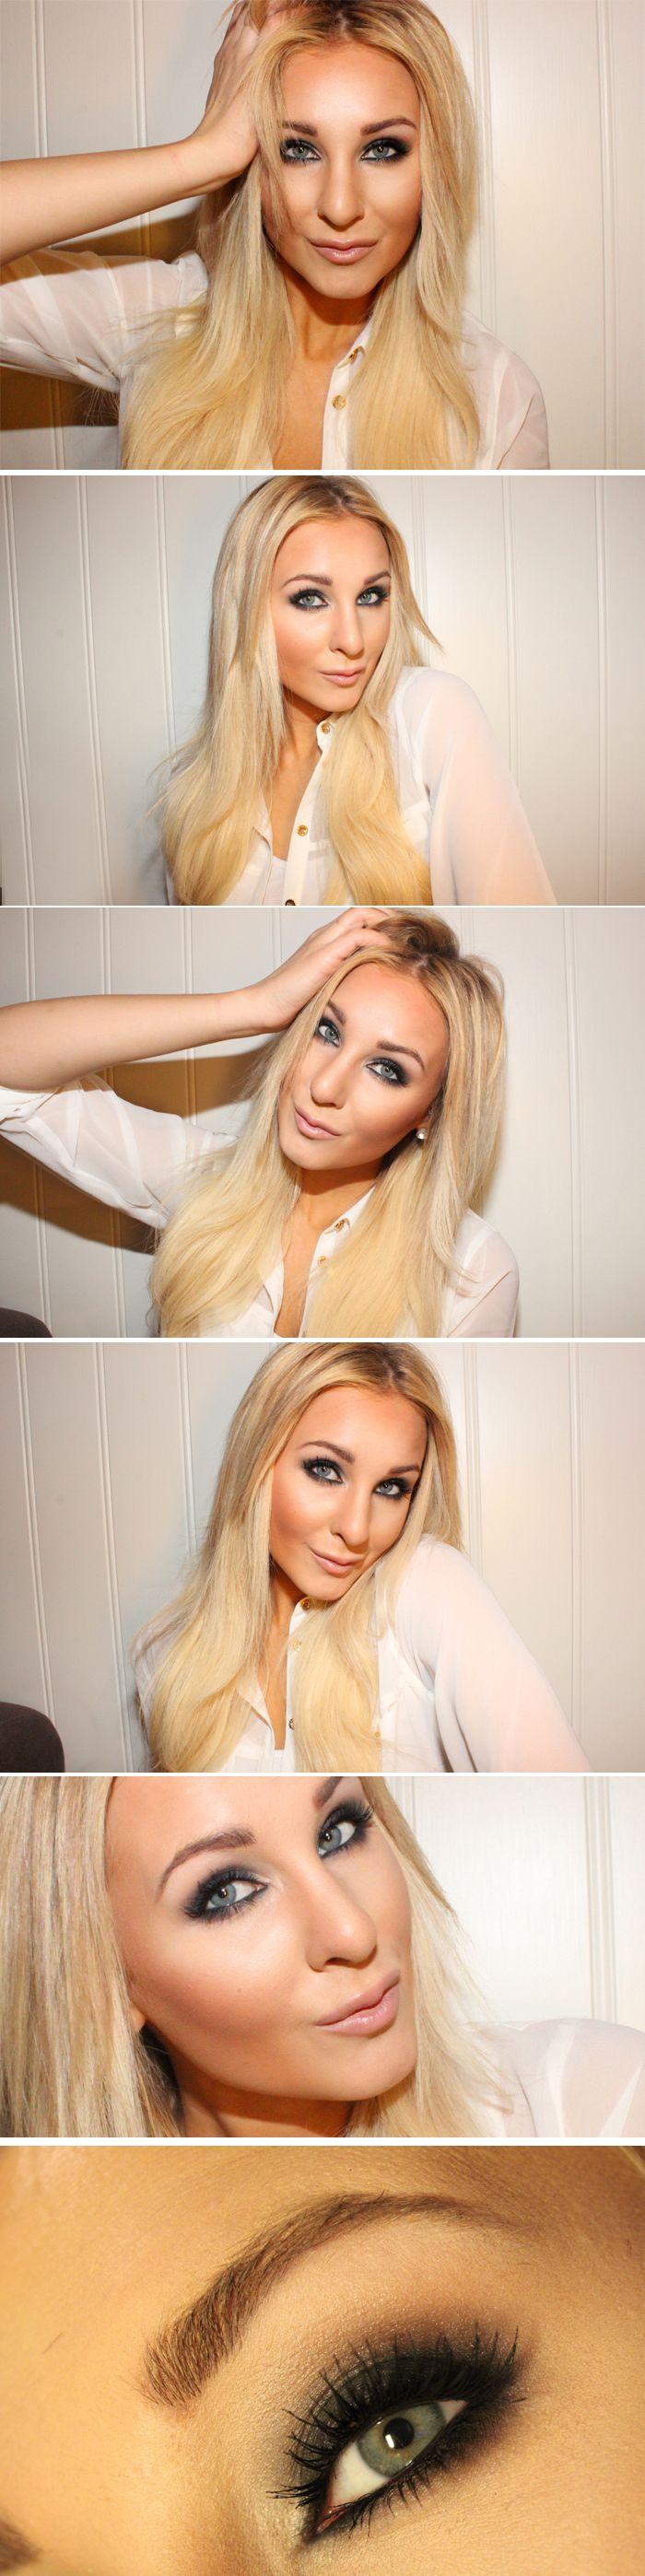 Dagens makeup | Helen Torsgården – Hiilens sminkblogg | Sida 13